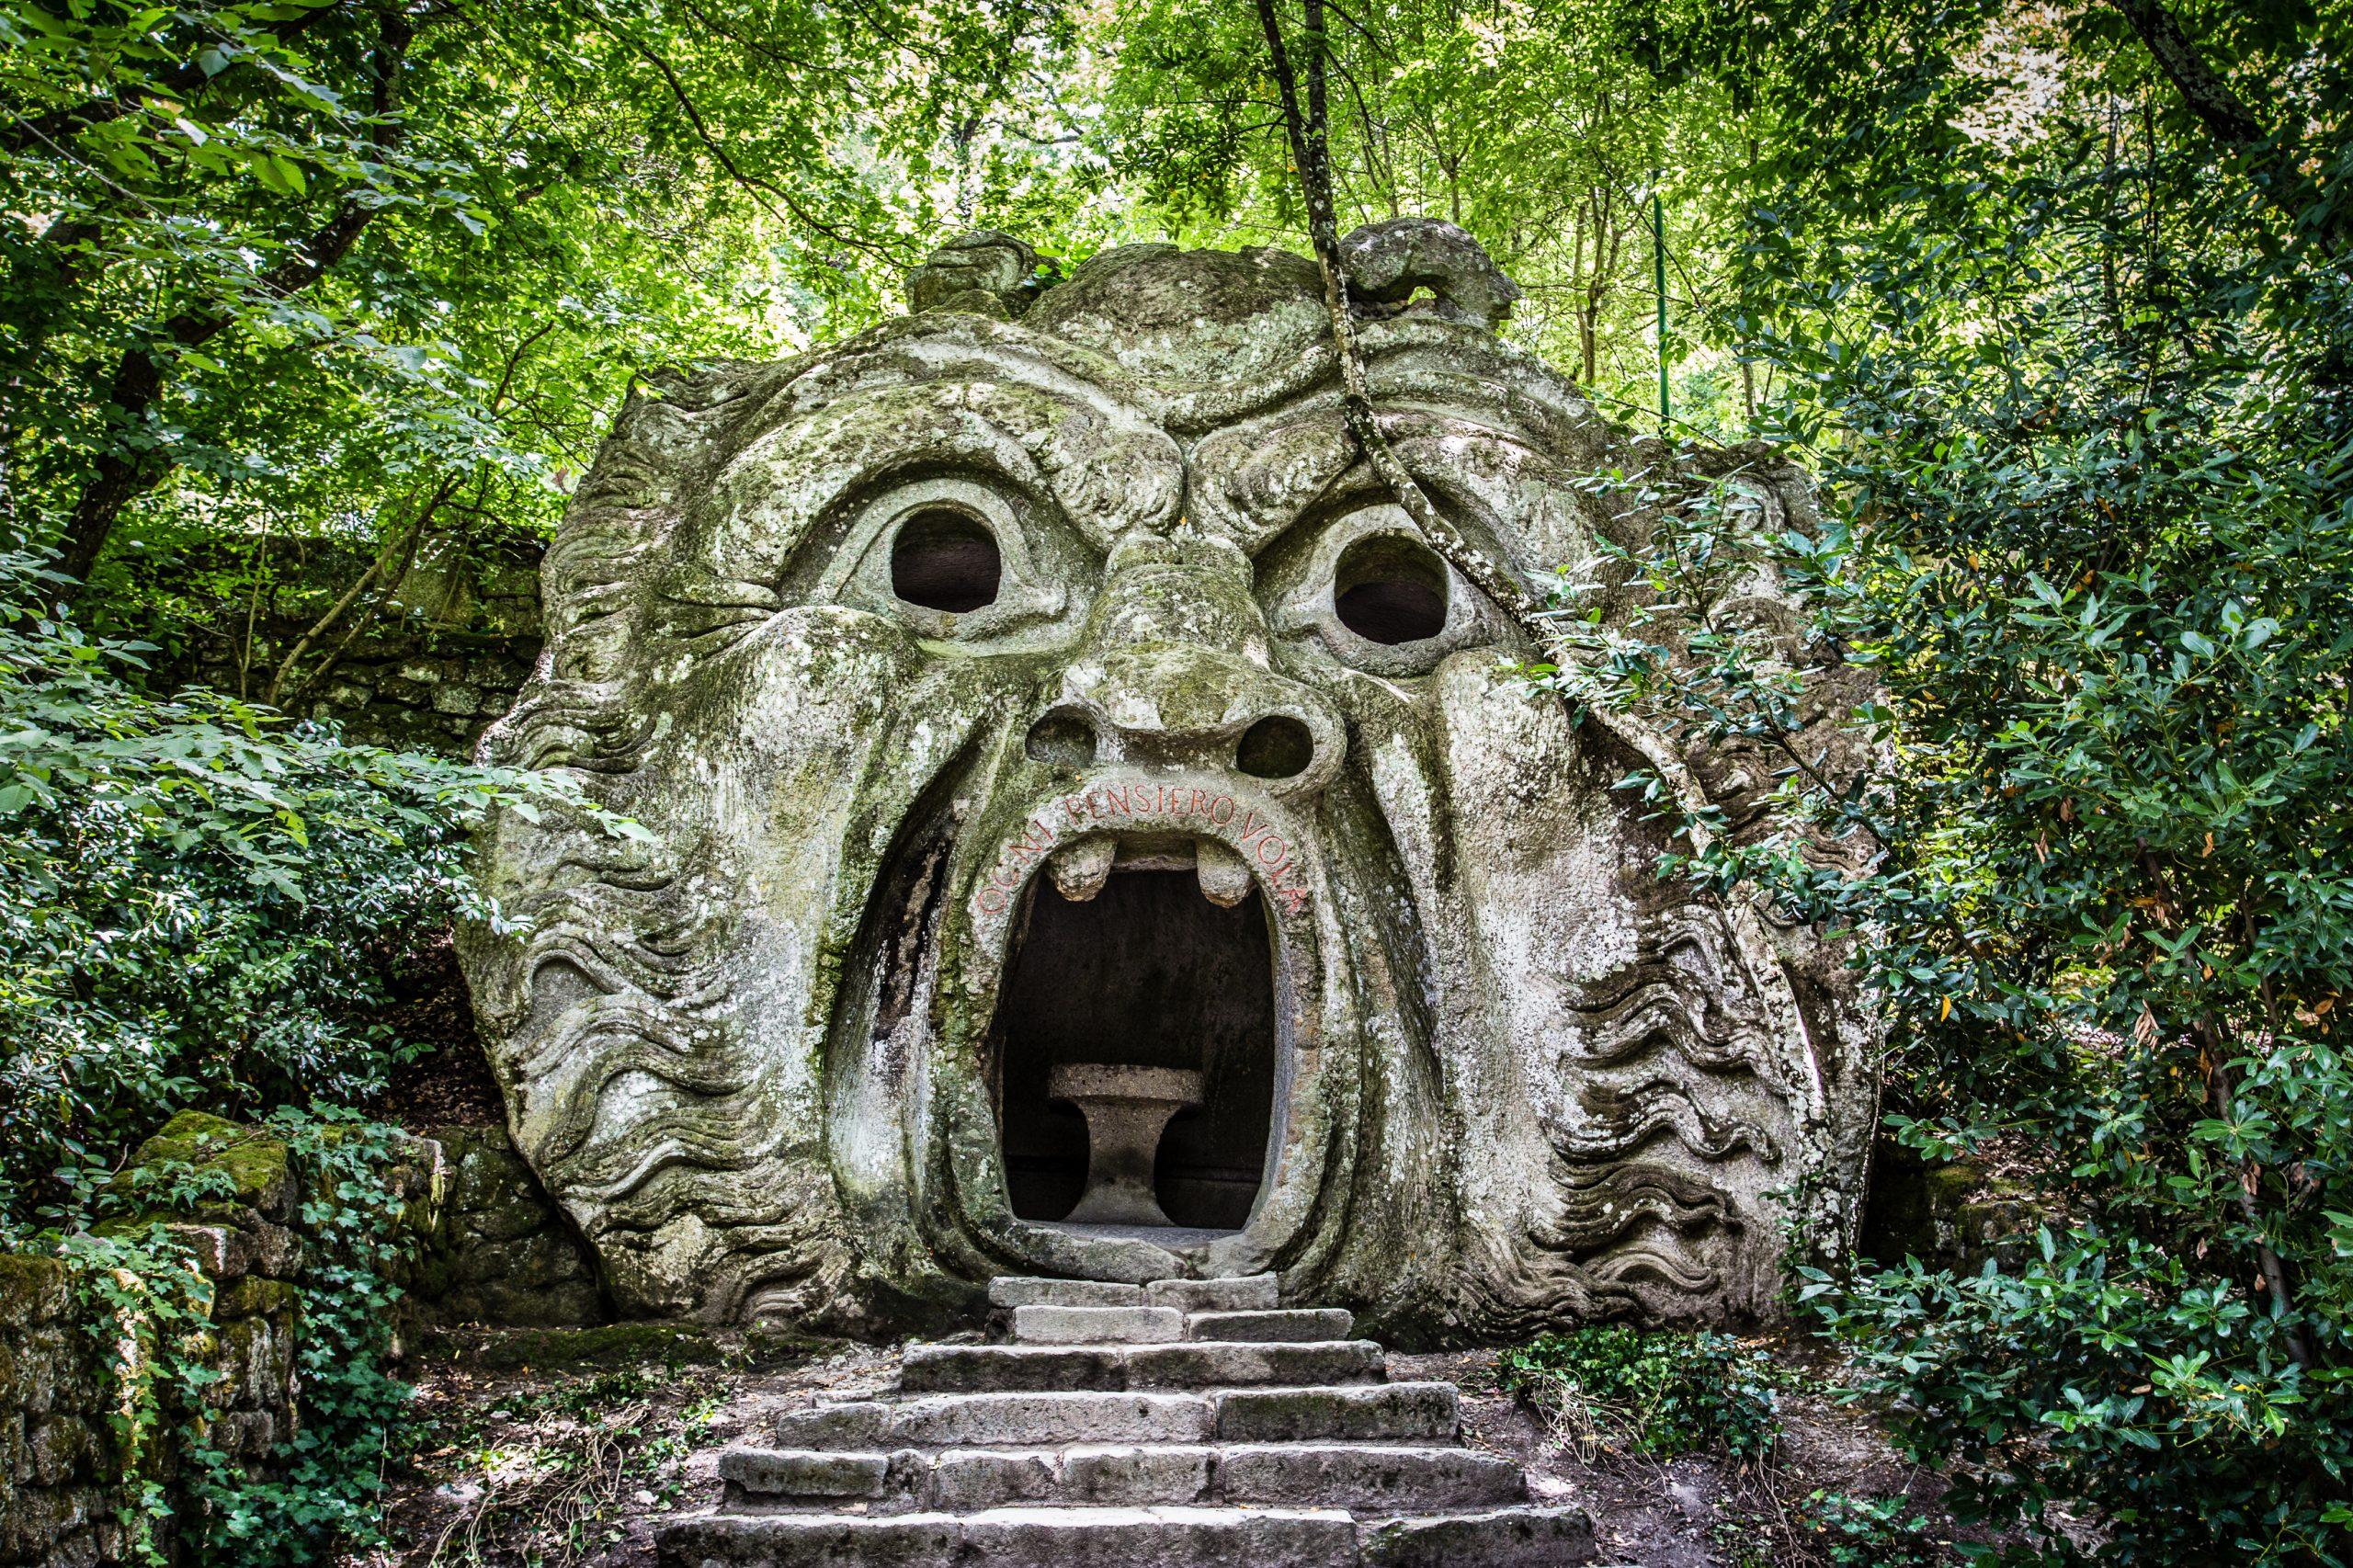 Orcus,Mouth,Sculpture,At,Famous,Parco,Dei,Mostri,(park,Of